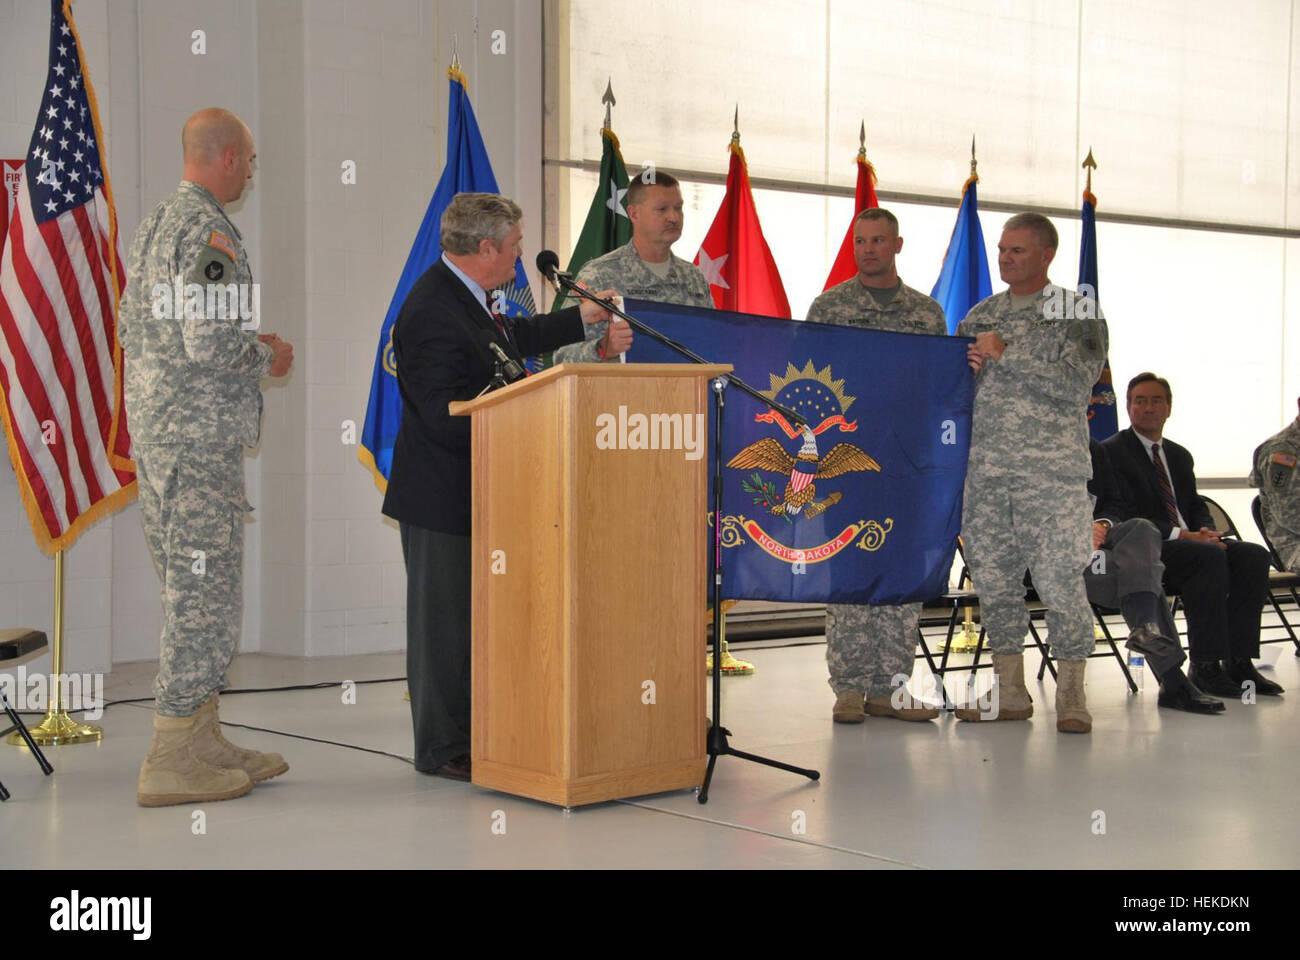 Kosovo Forces Stock Photos Images Alamy Custom Paint Job 2002 Daged Akota Dalrymple Presents The Leadership Of North Dakota National Guards Headquarters And Company